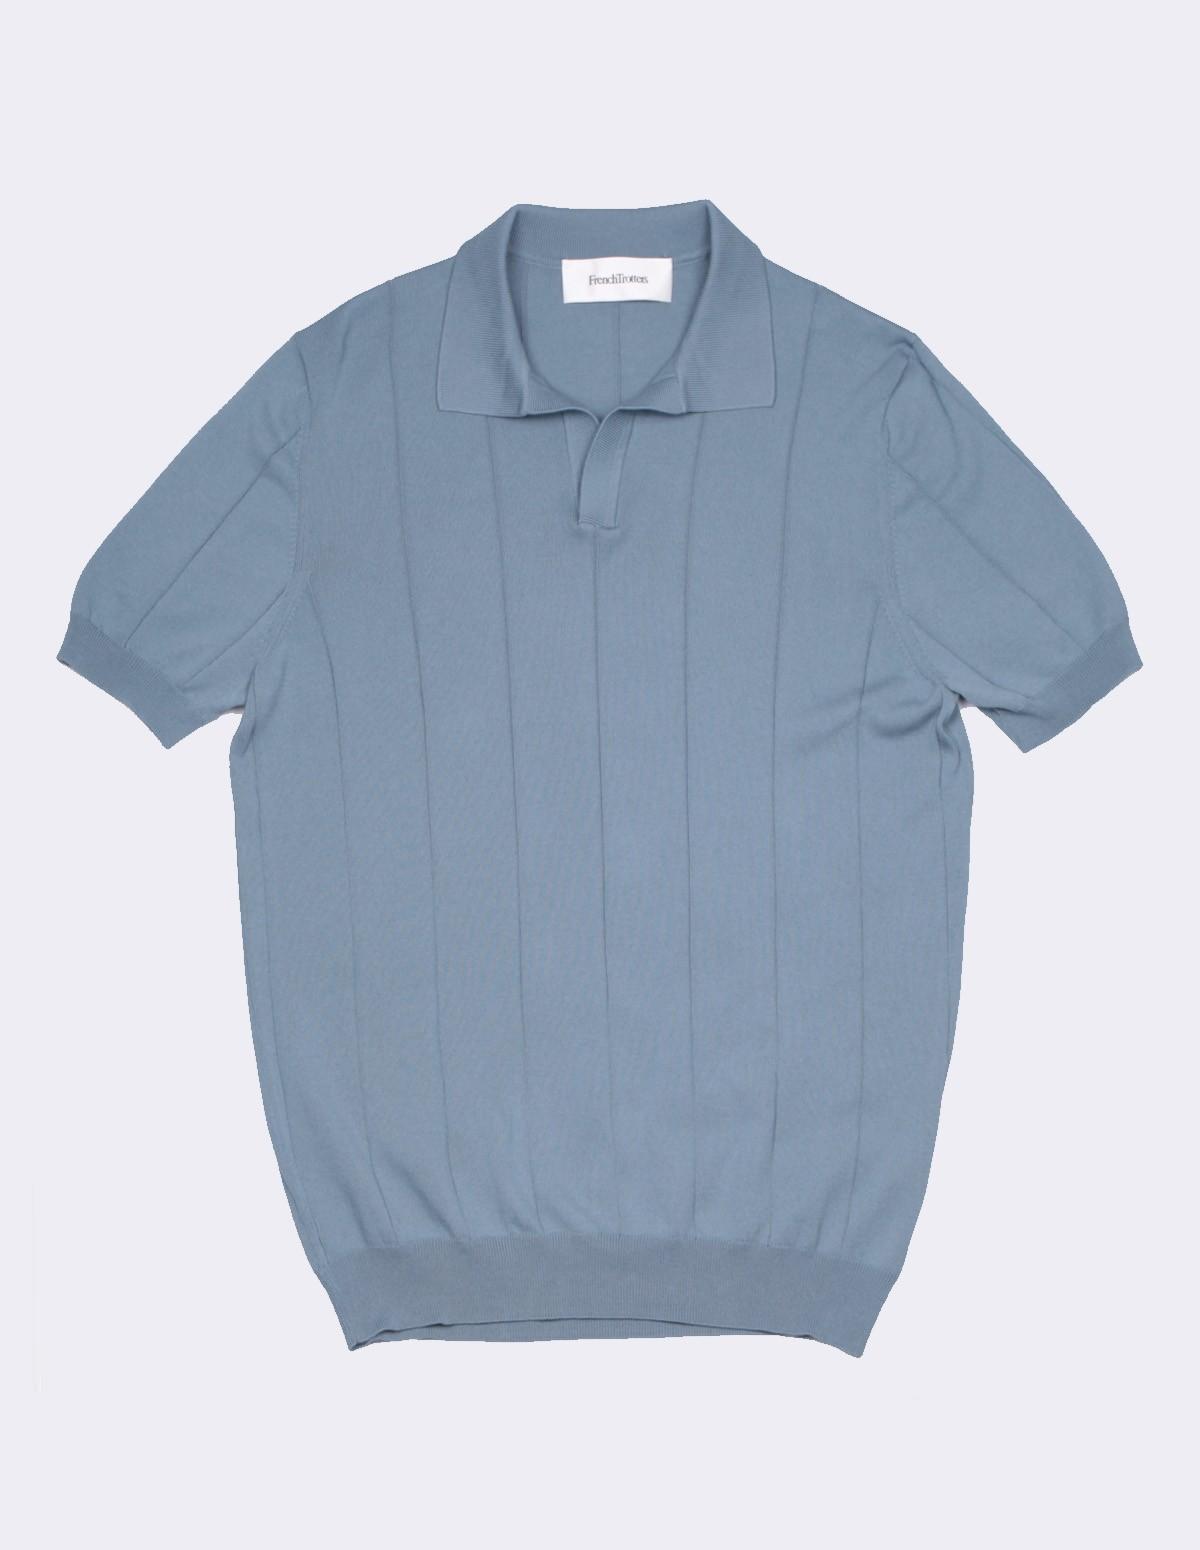 Ft Polo 57191/20660 - 548 VINTAGE BLUE